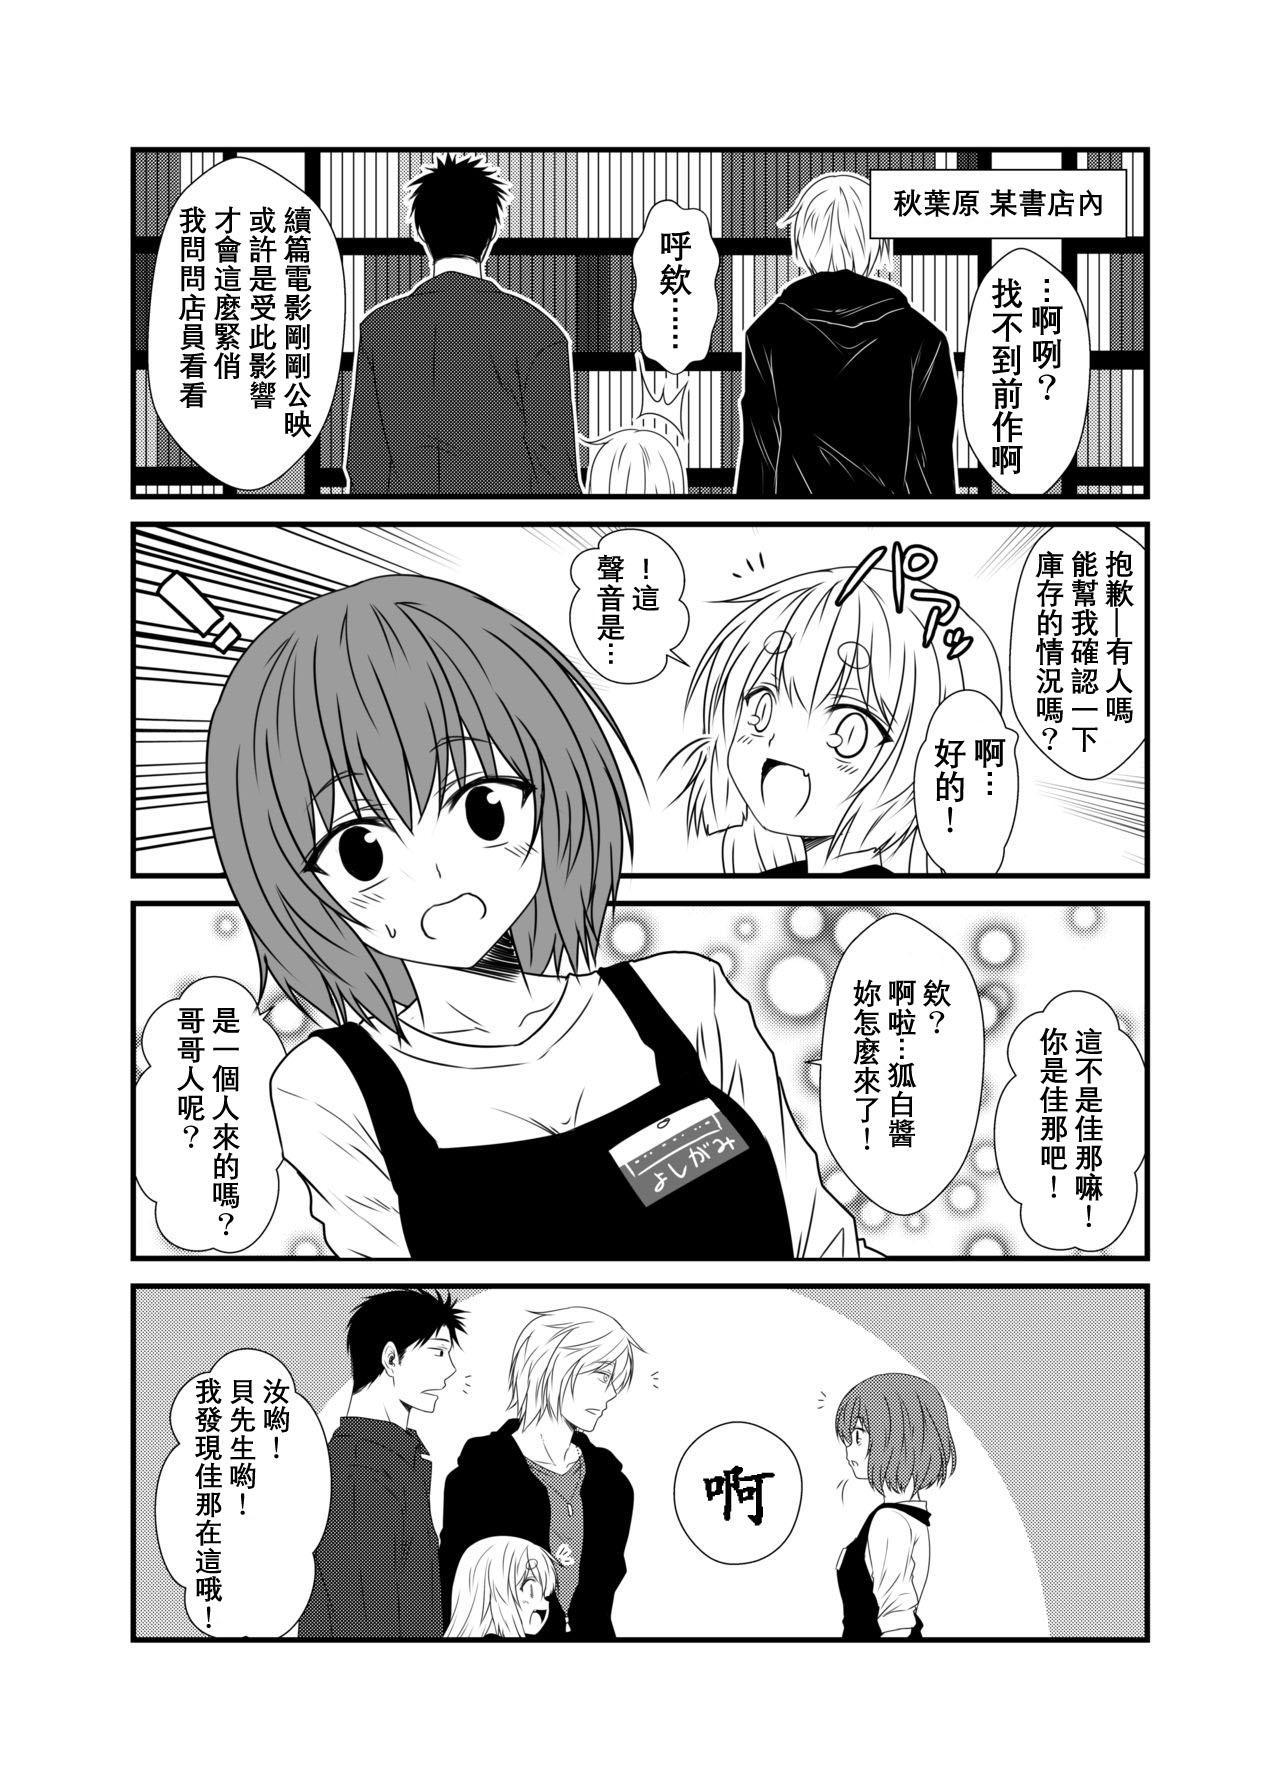 Kohaku Biyori Vol. 5 13